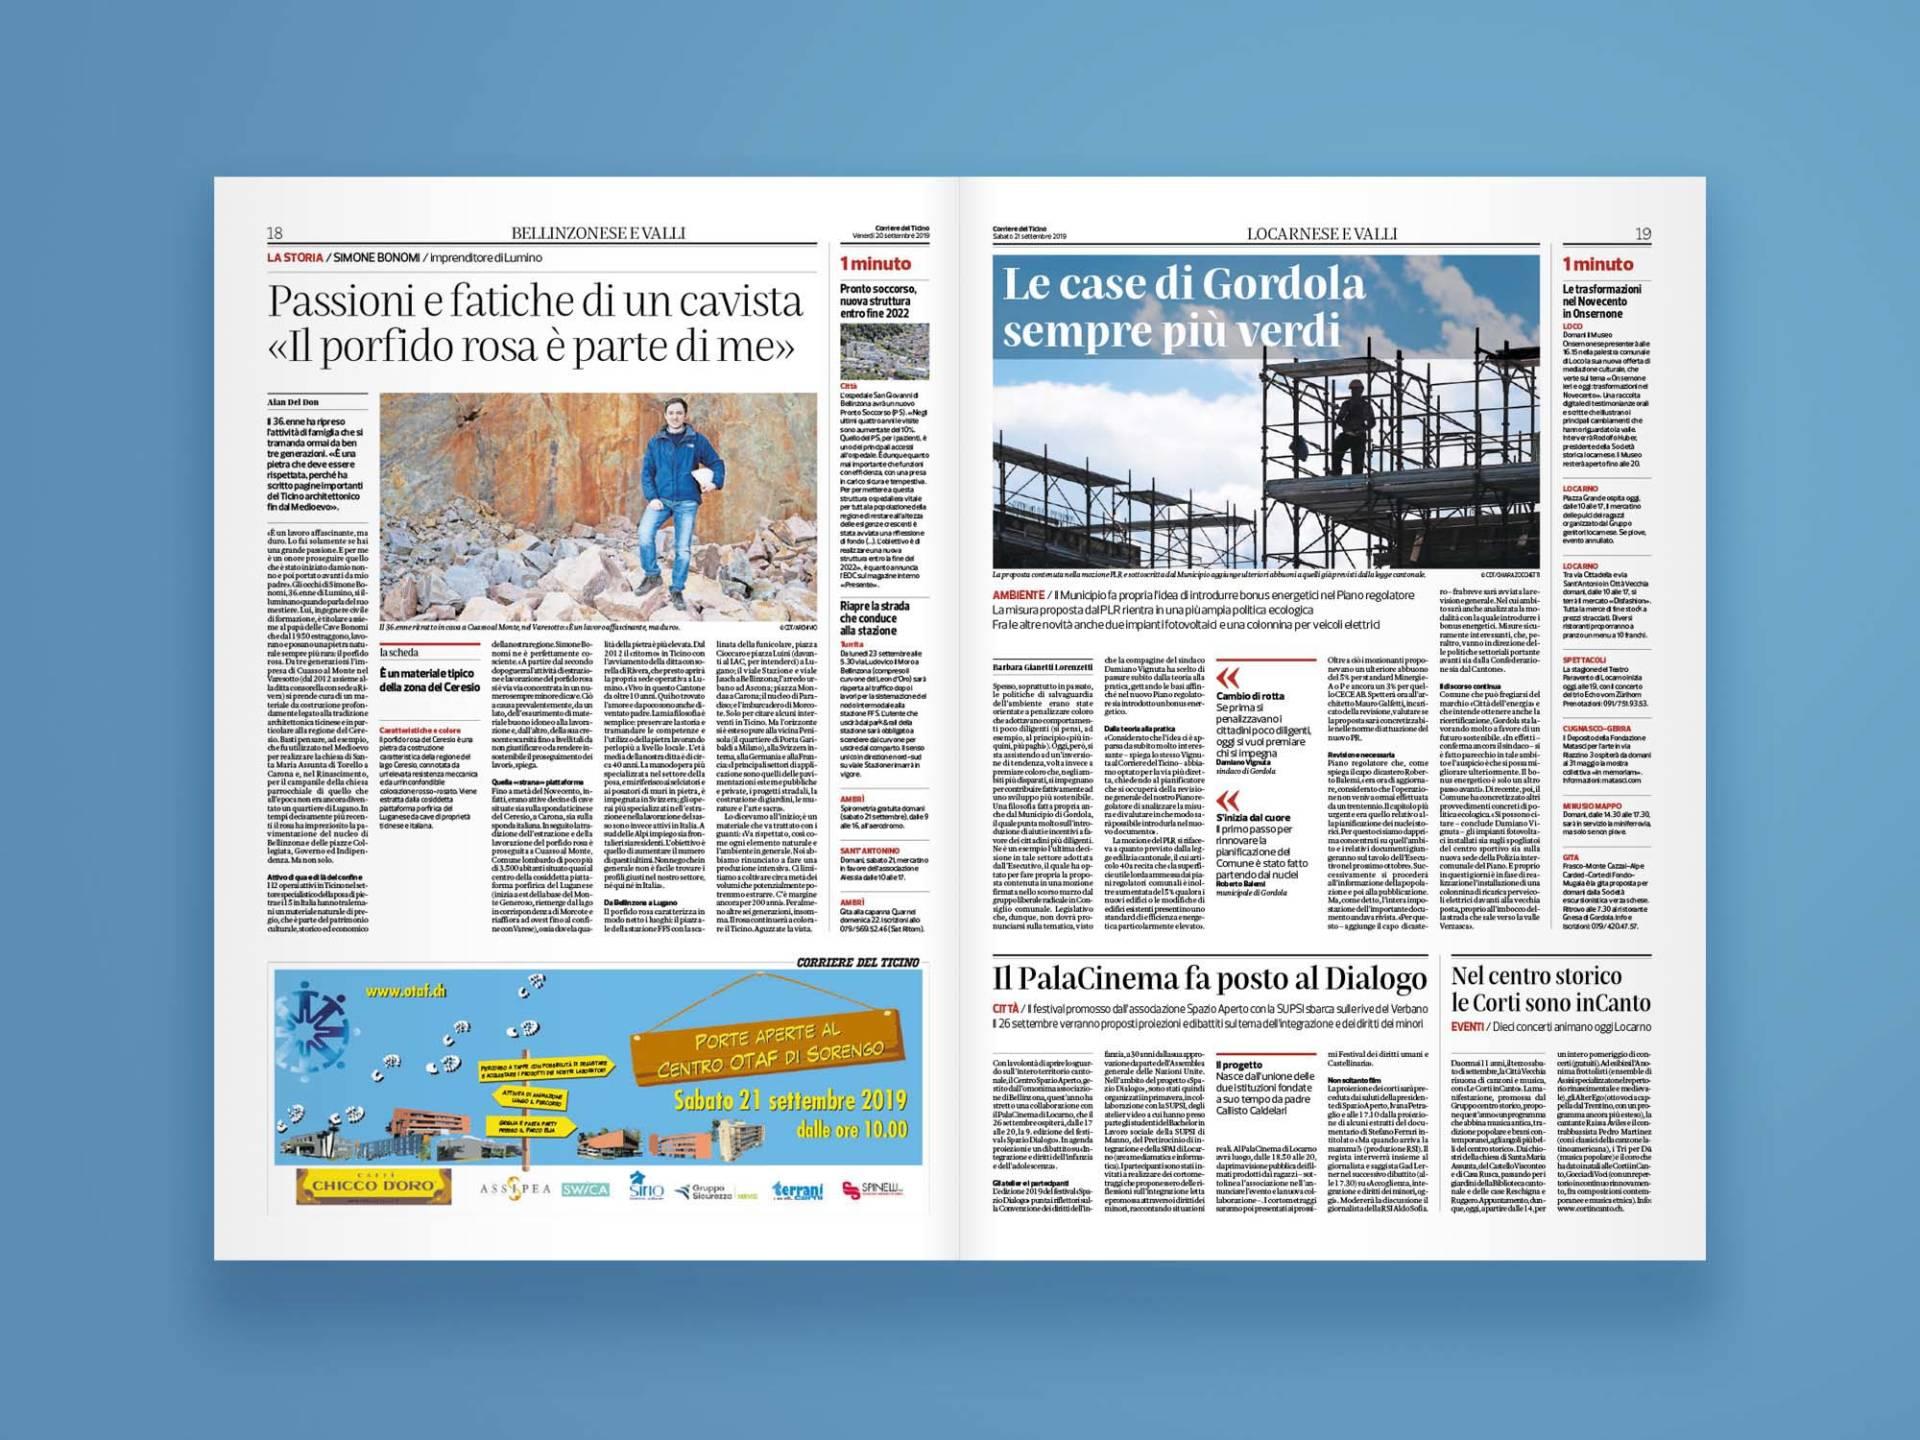 Corriere_Del_Ticino_08_Wenceslau_News_Design